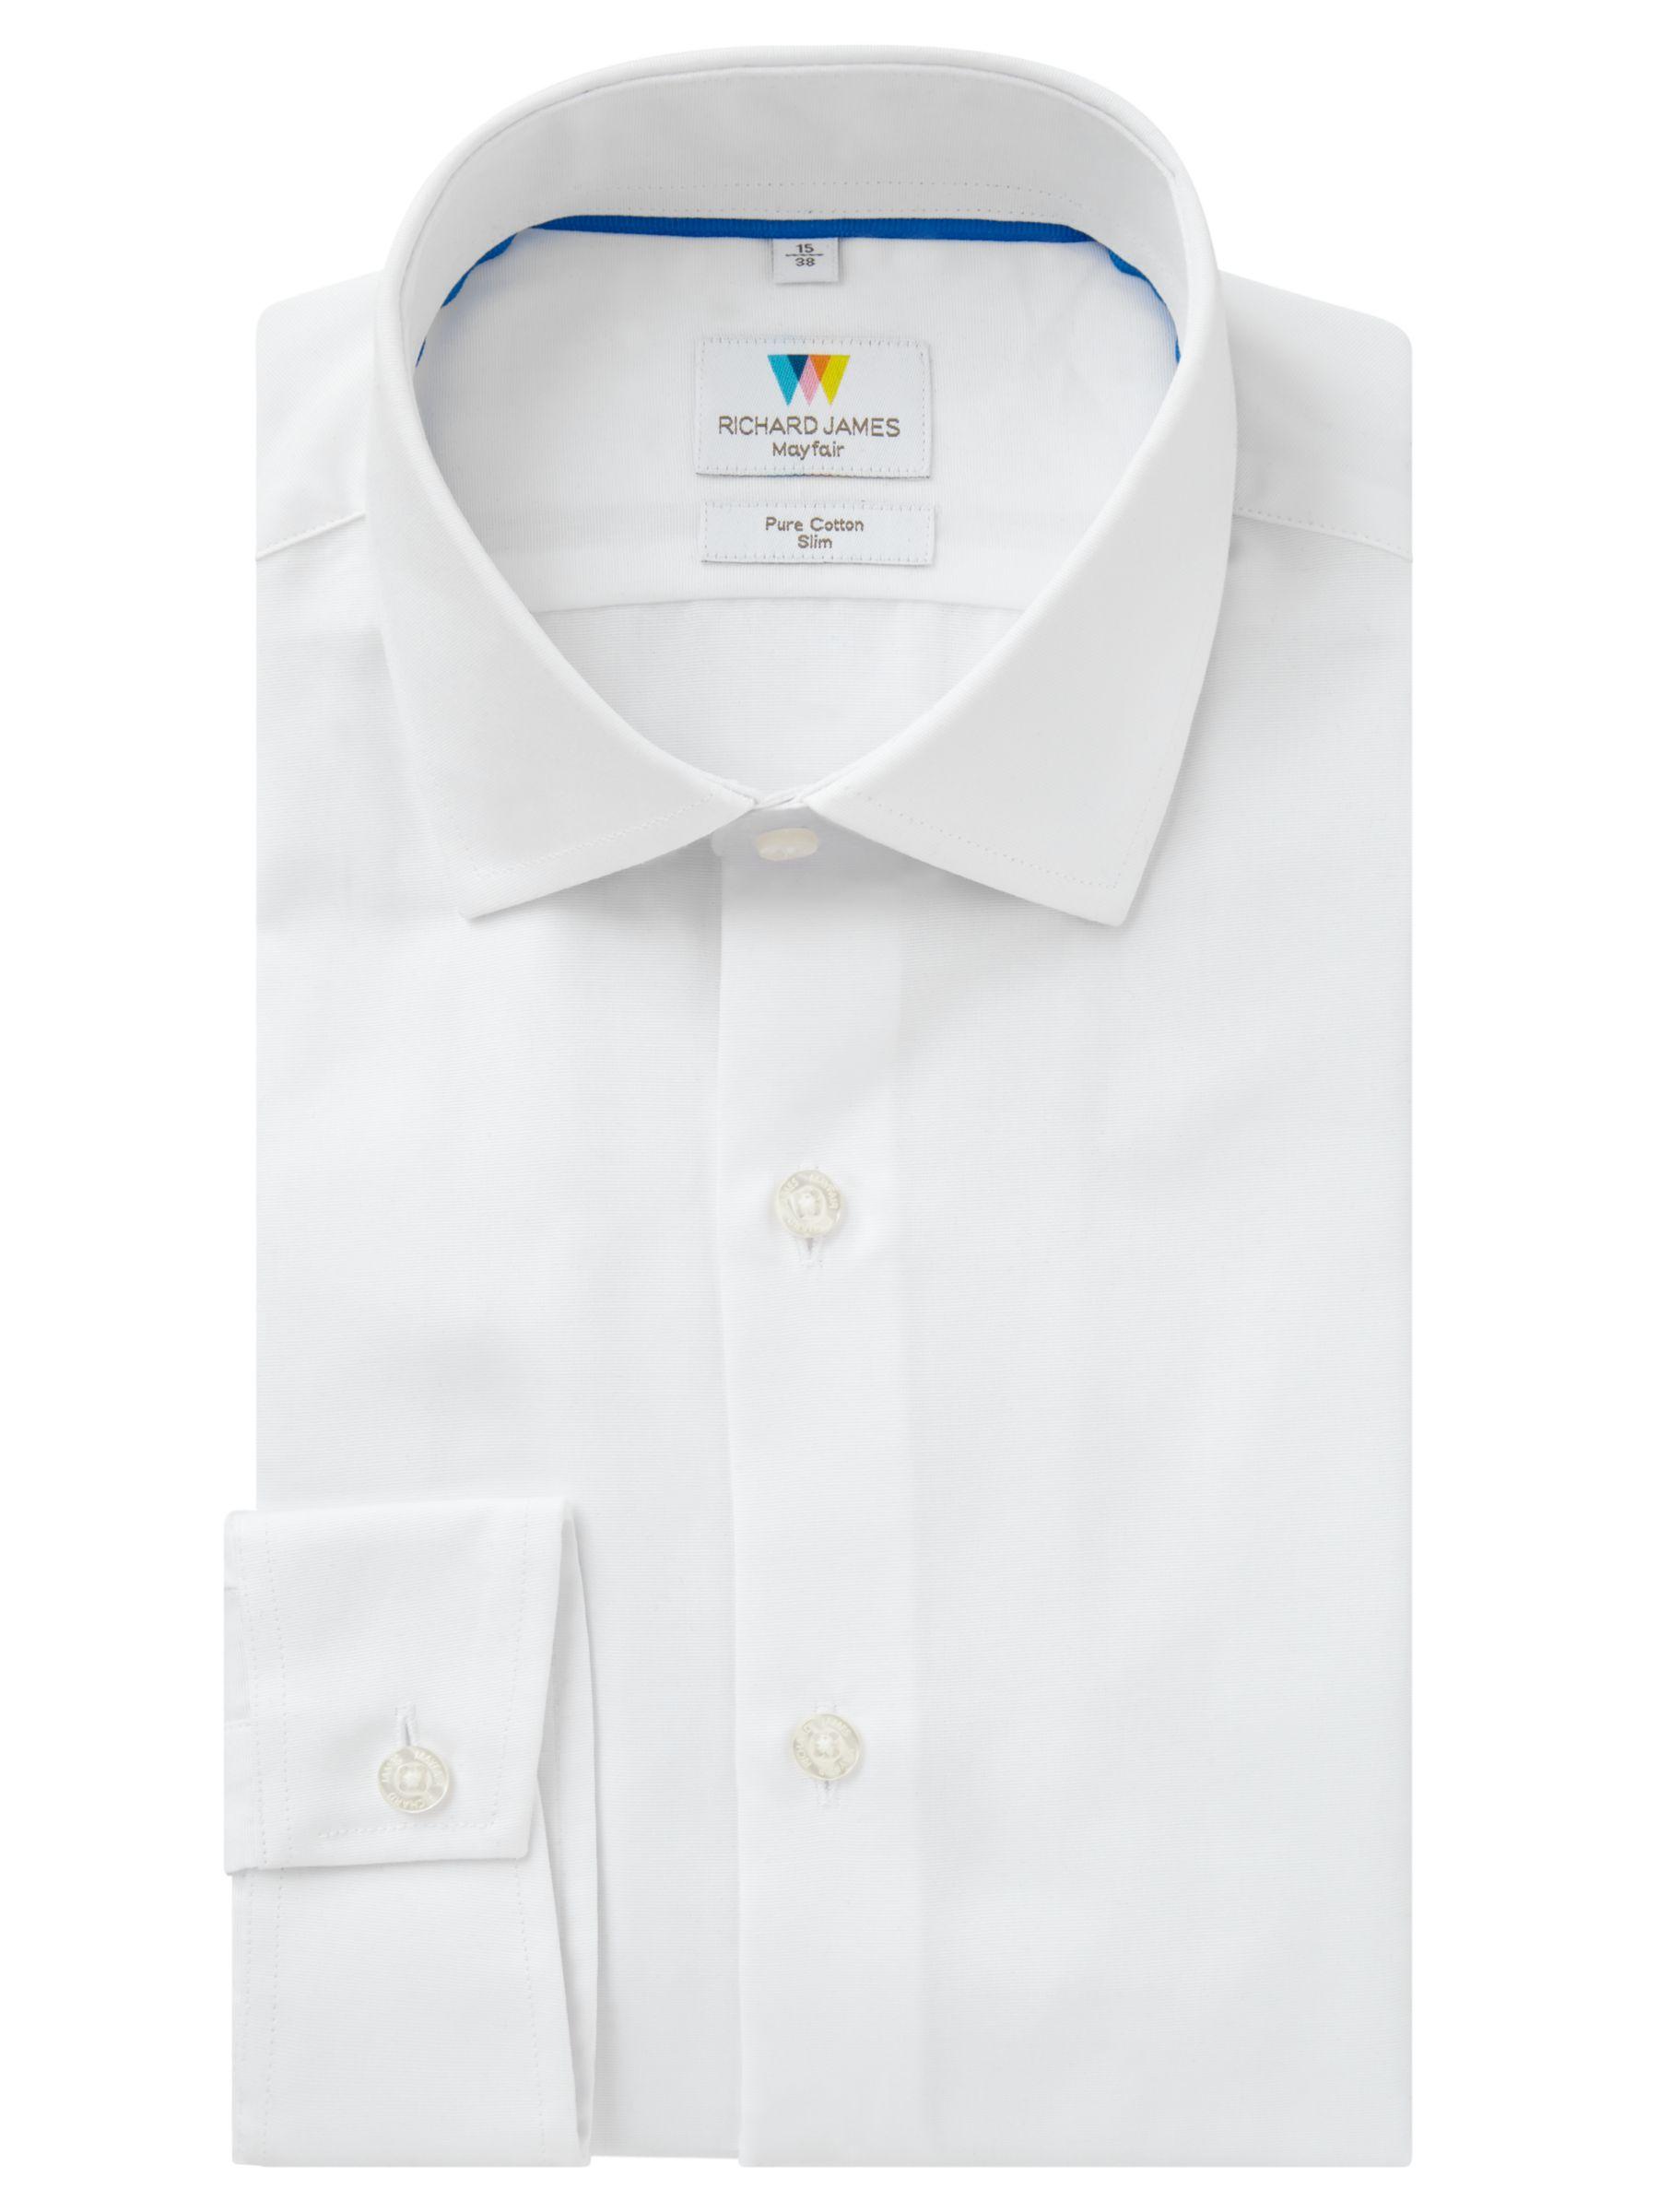 Richard James Mayfair Richard James Mayfair Ottoman Slim Fit Shirt, White